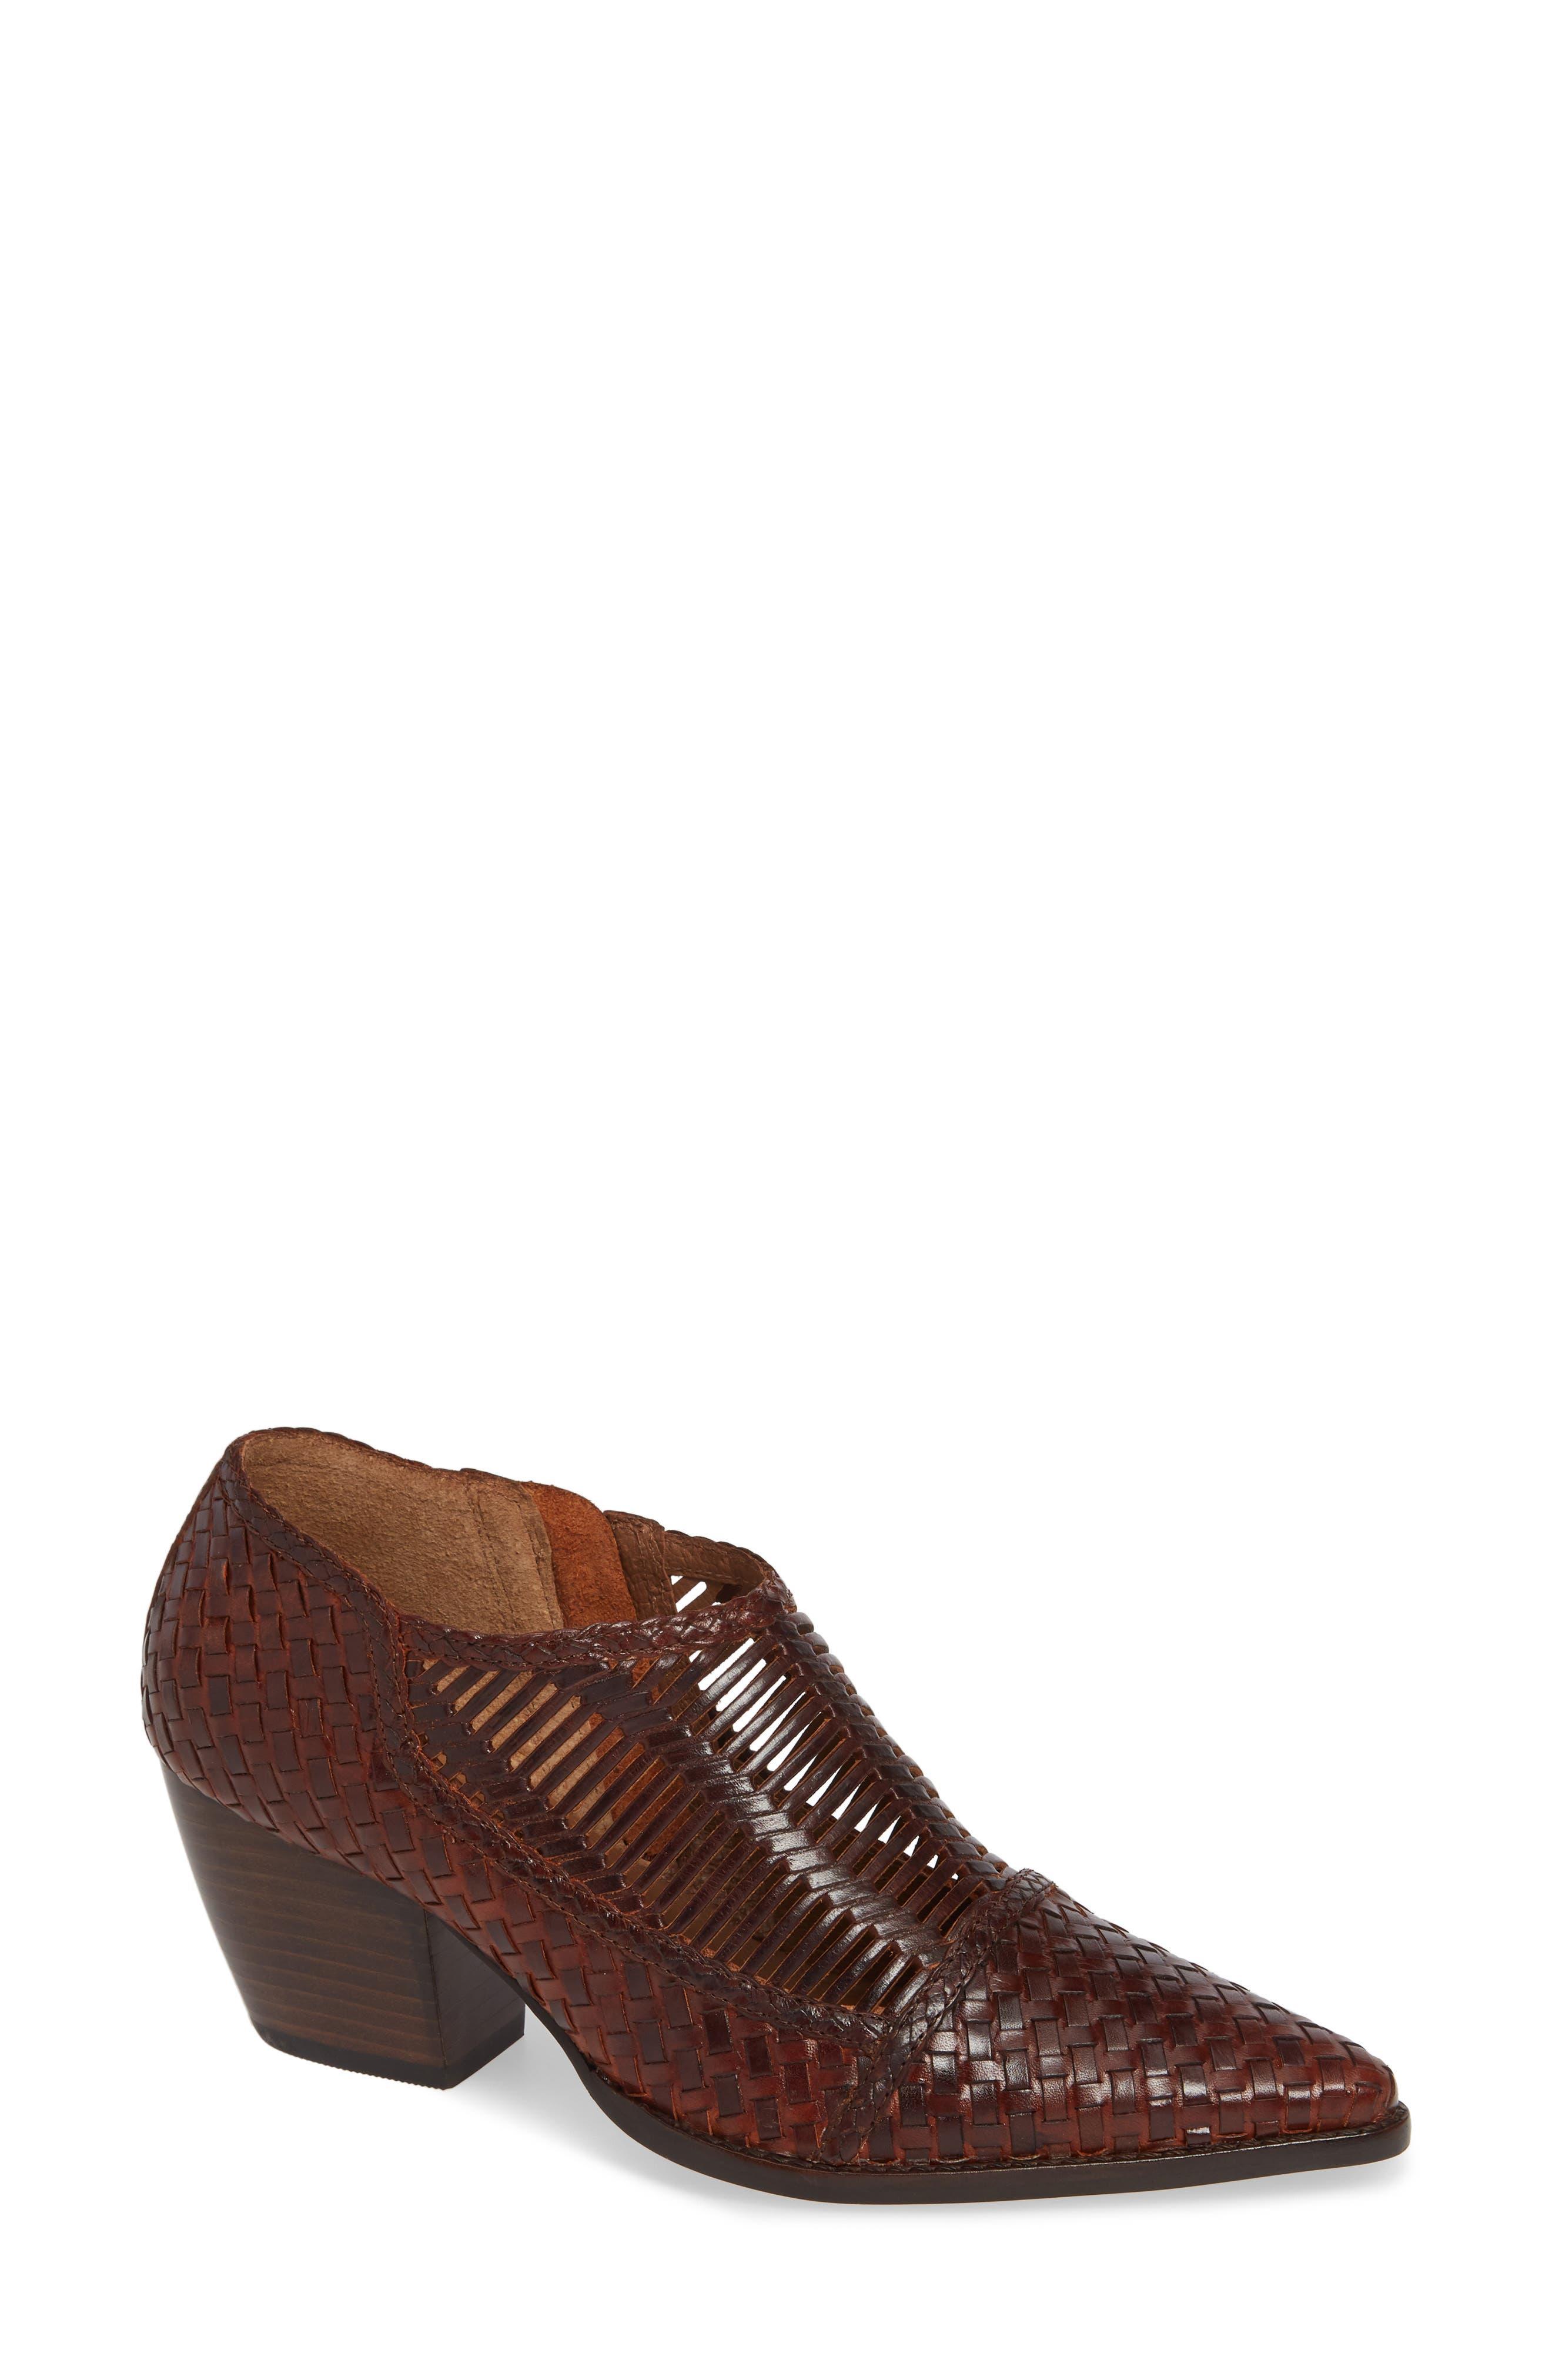 Matisse Vigo Woven Bootie- Brown